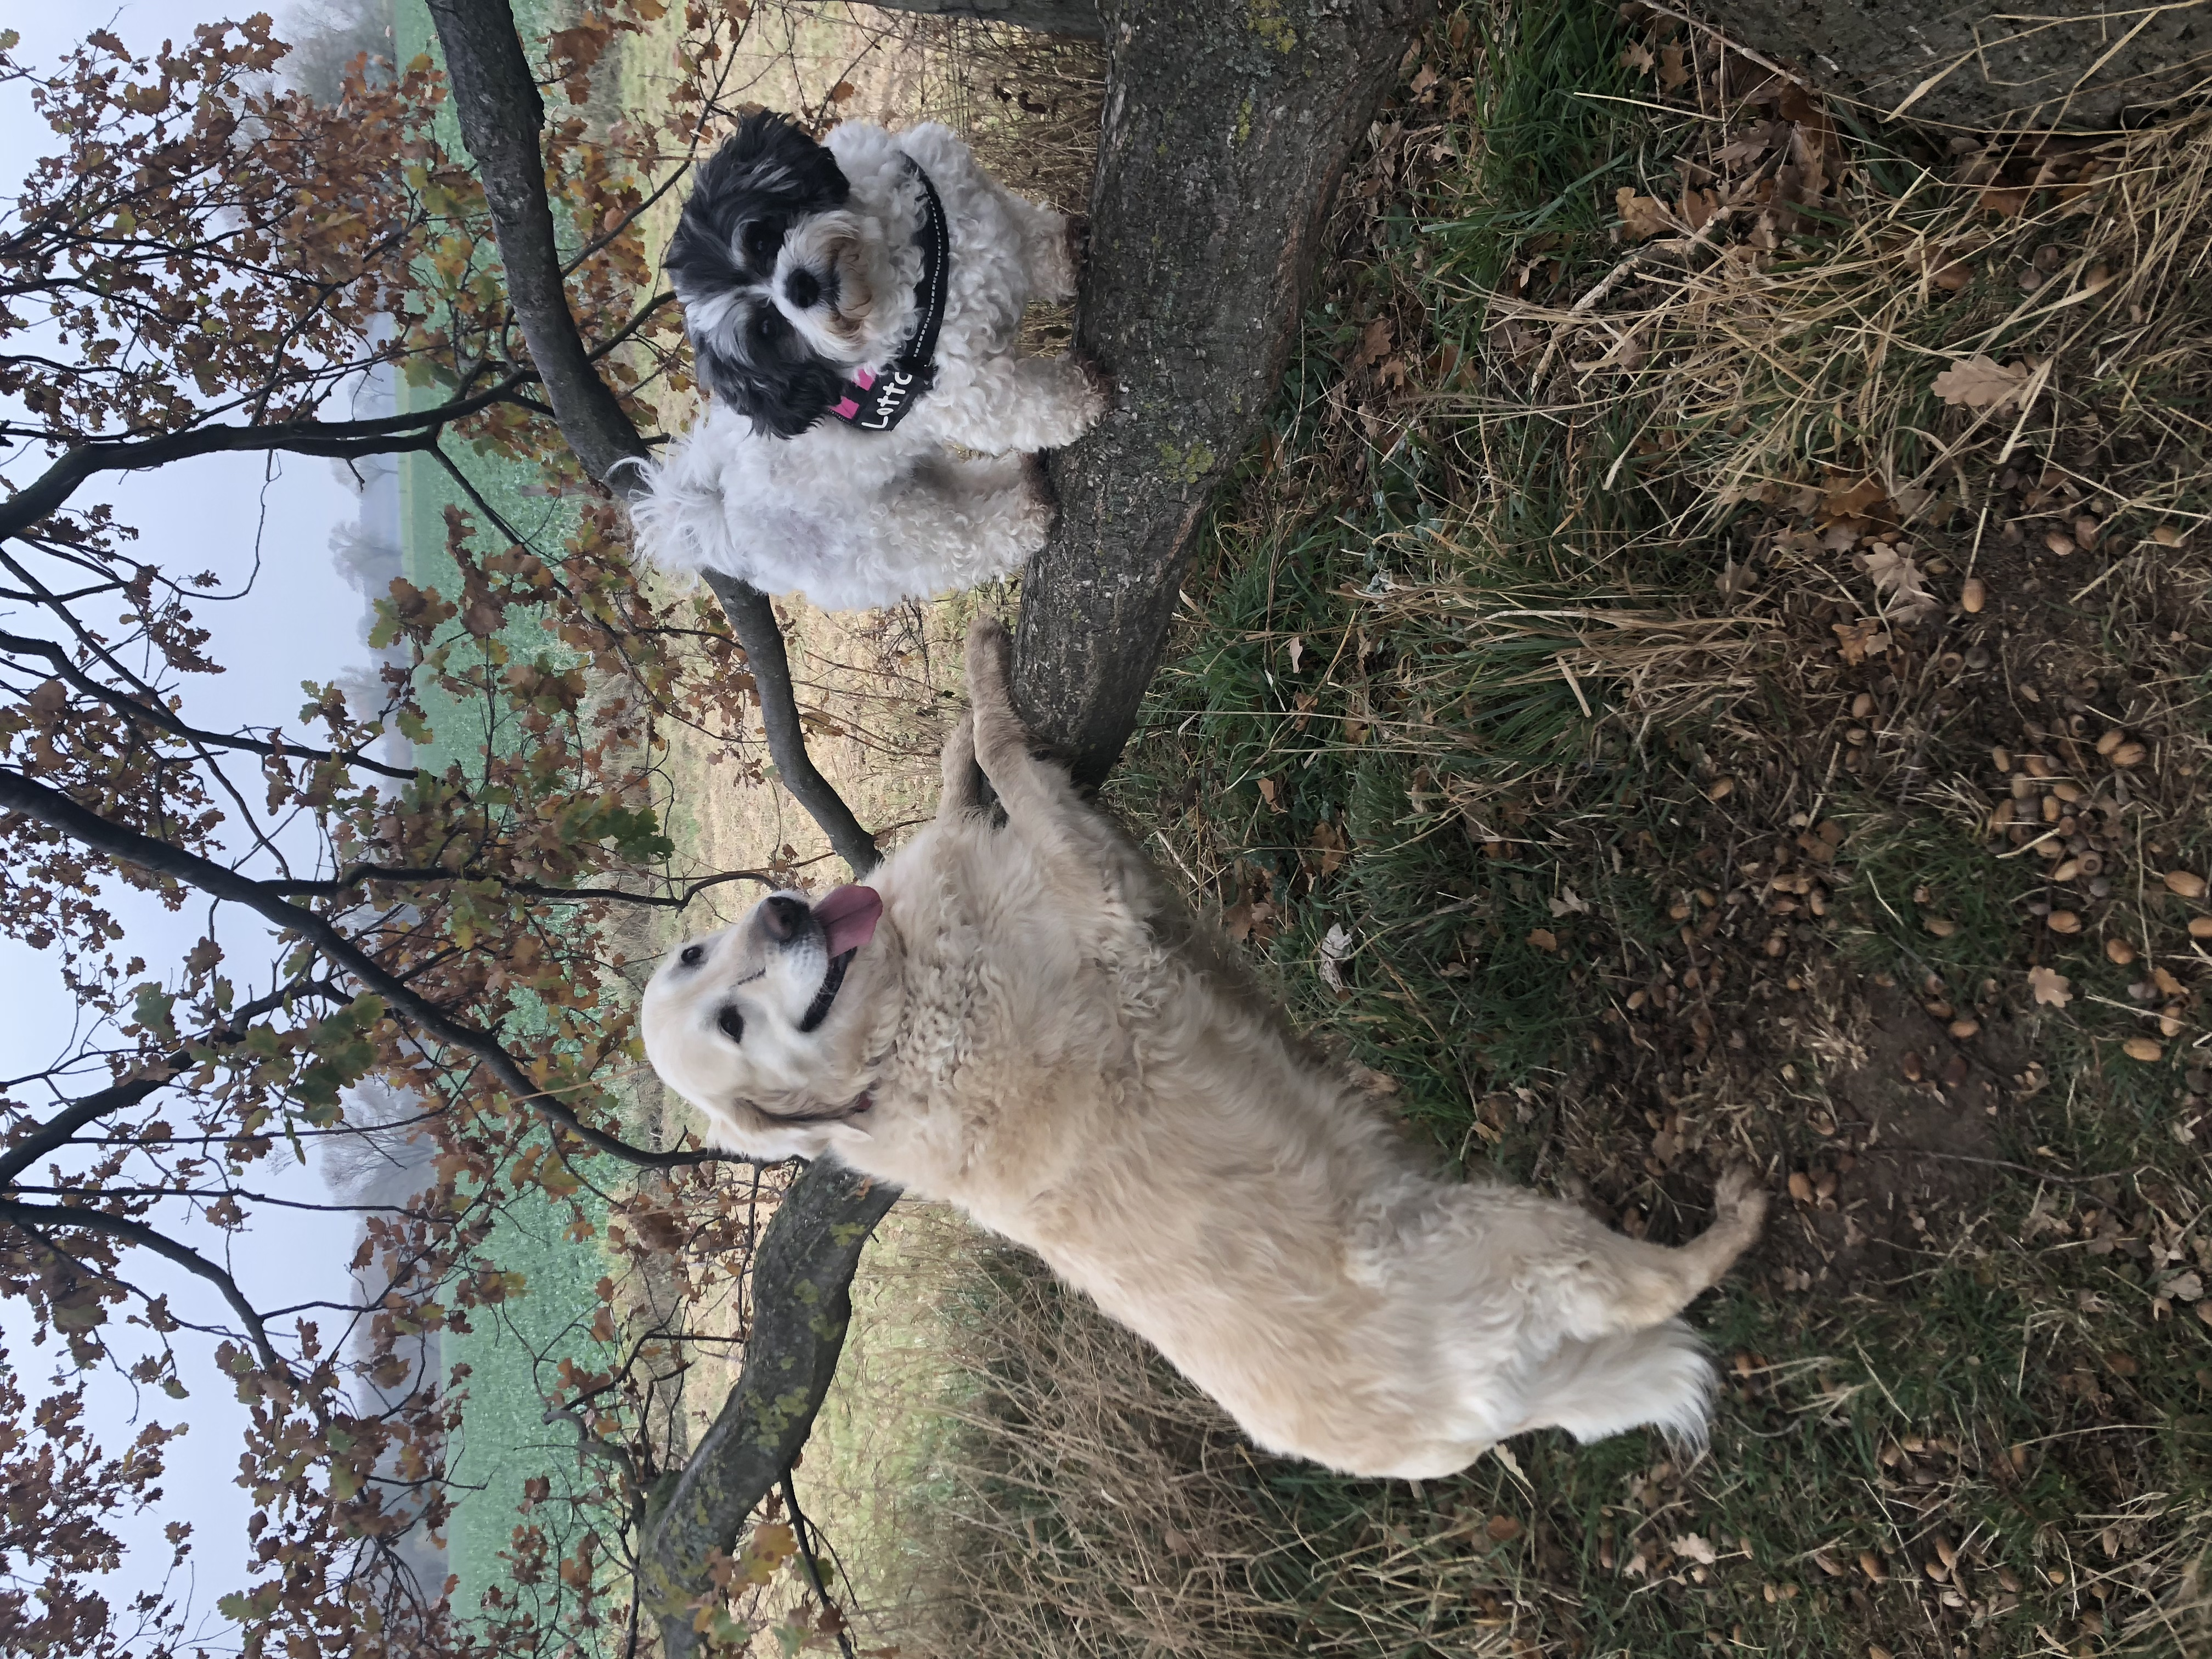 Hunde Foto: Ramona und Emily & Lotta – Emmchen & Lottchen